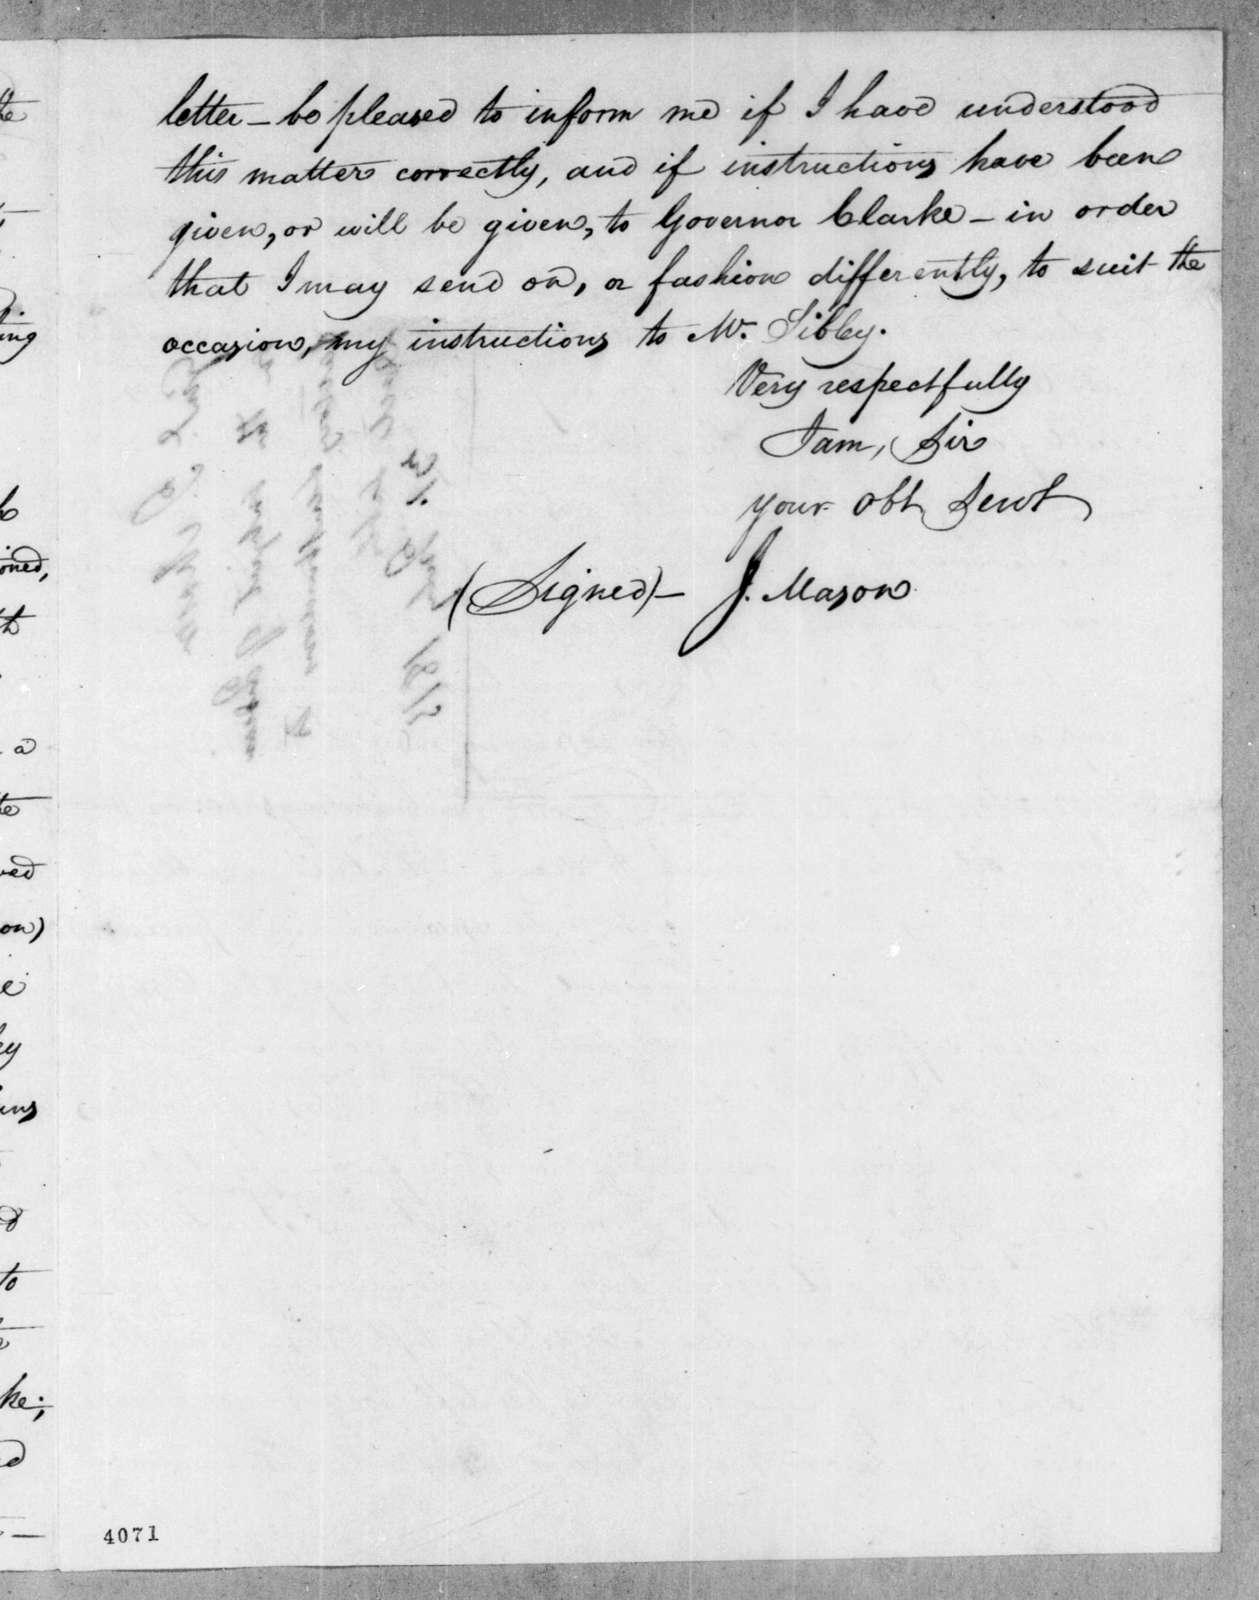 John Mason to George Graham, July 31, 1815